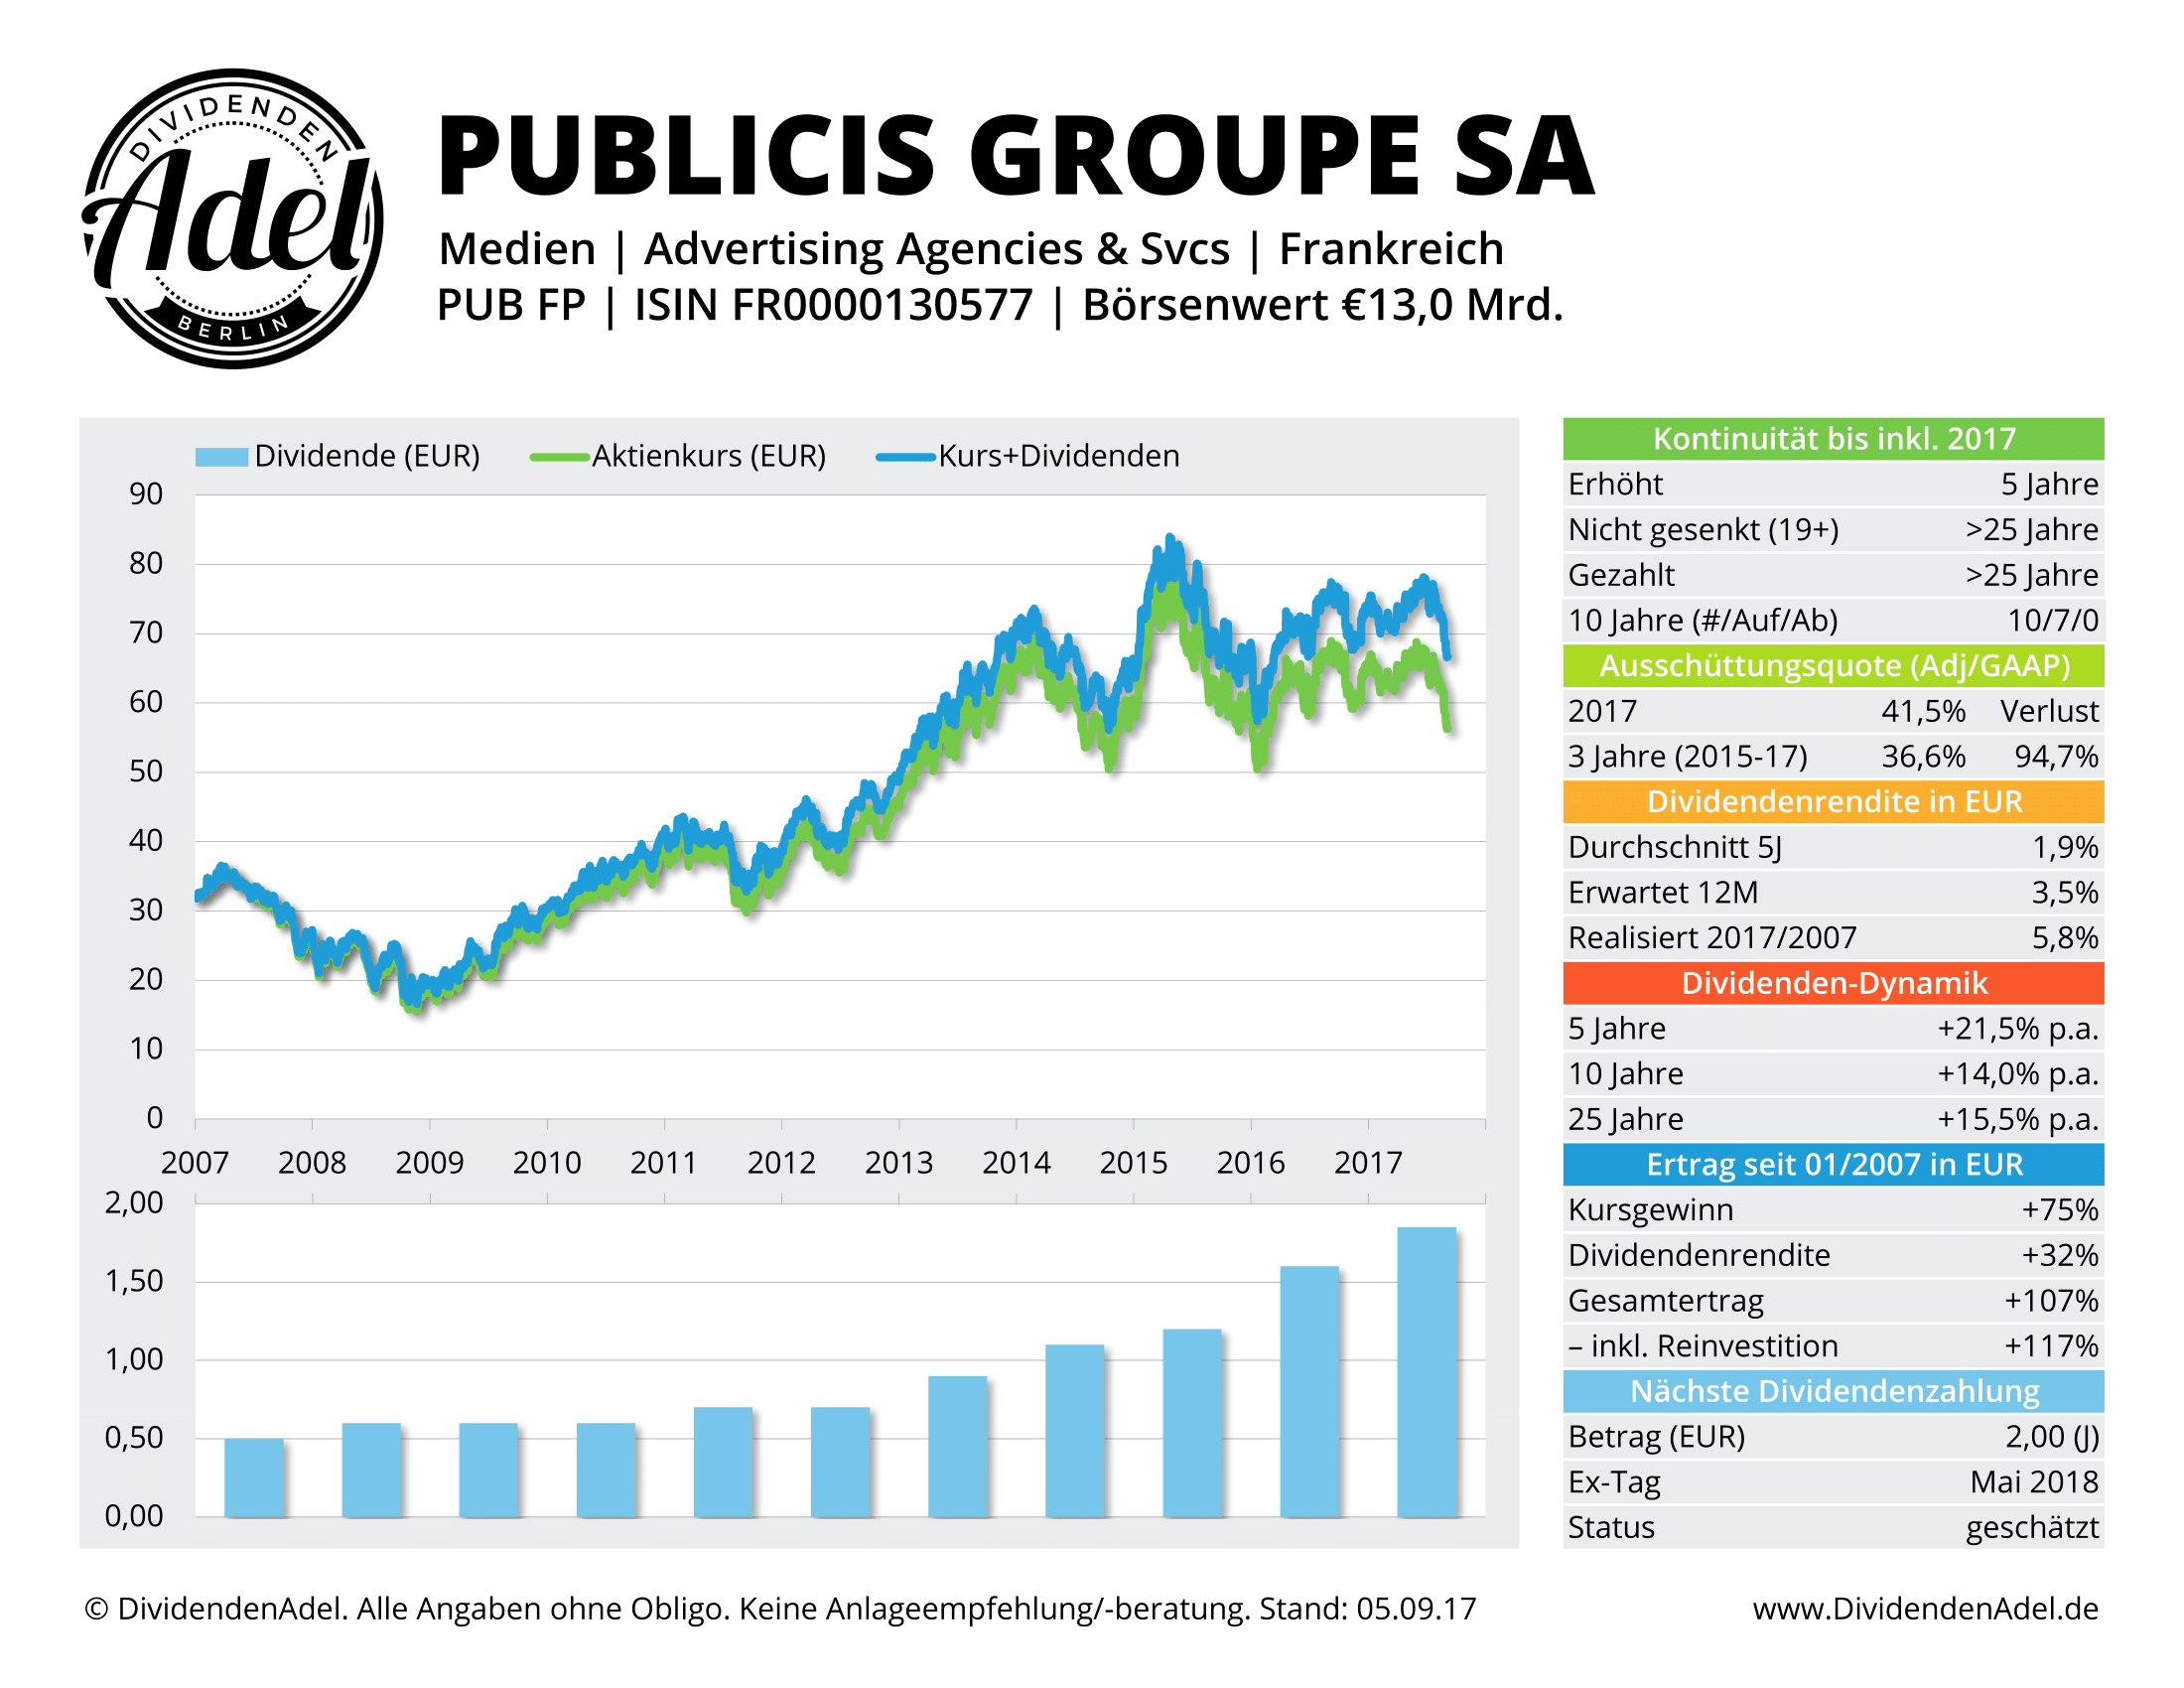 2017-09-05 37 PUBLICIS GROUPE DividendenAdel-Profil ab 2007-1